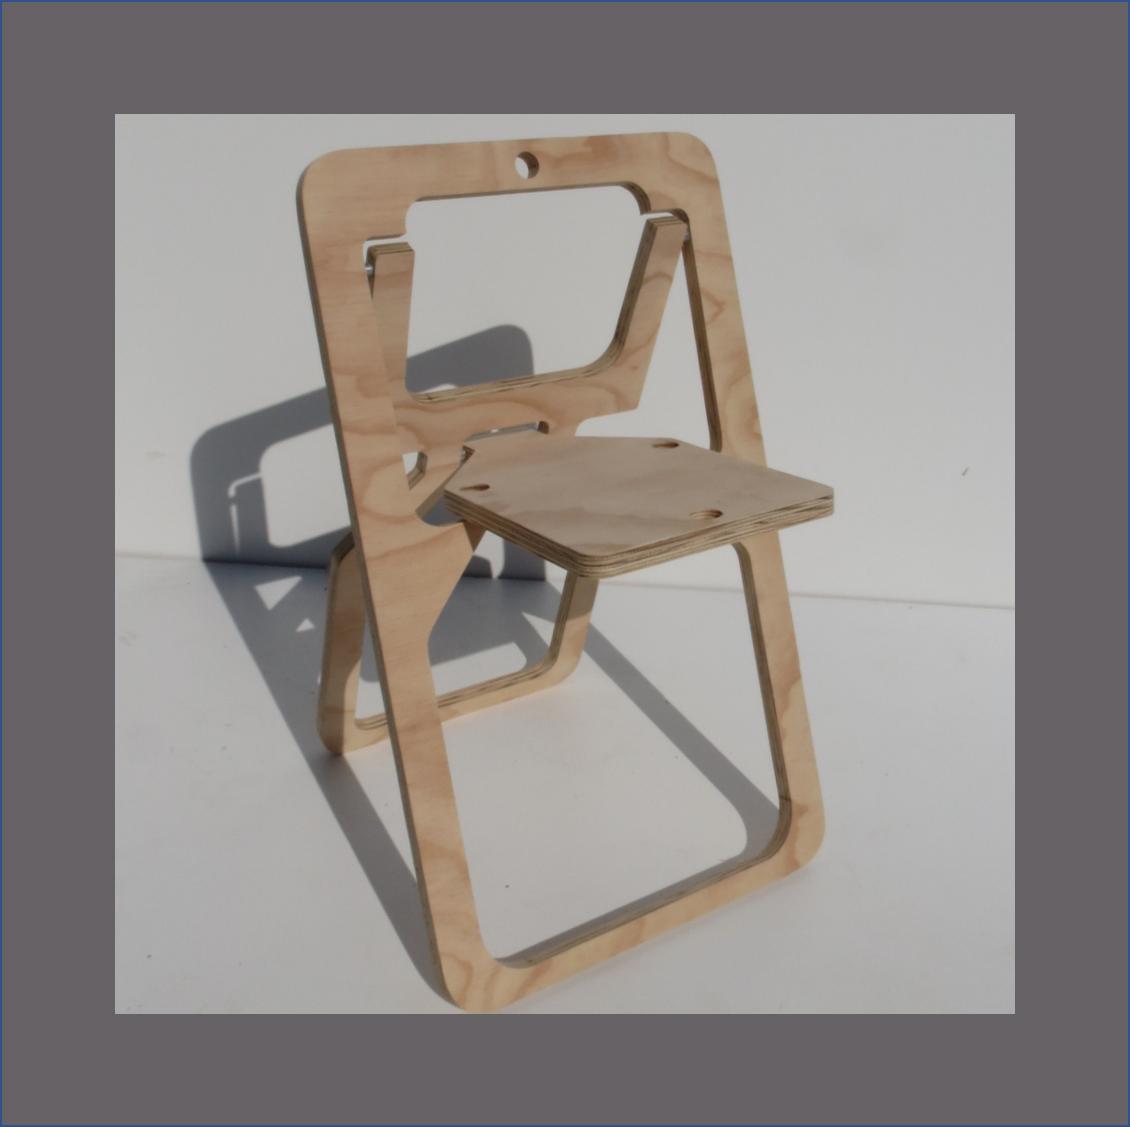 ikea-beach-wood-chair-adult